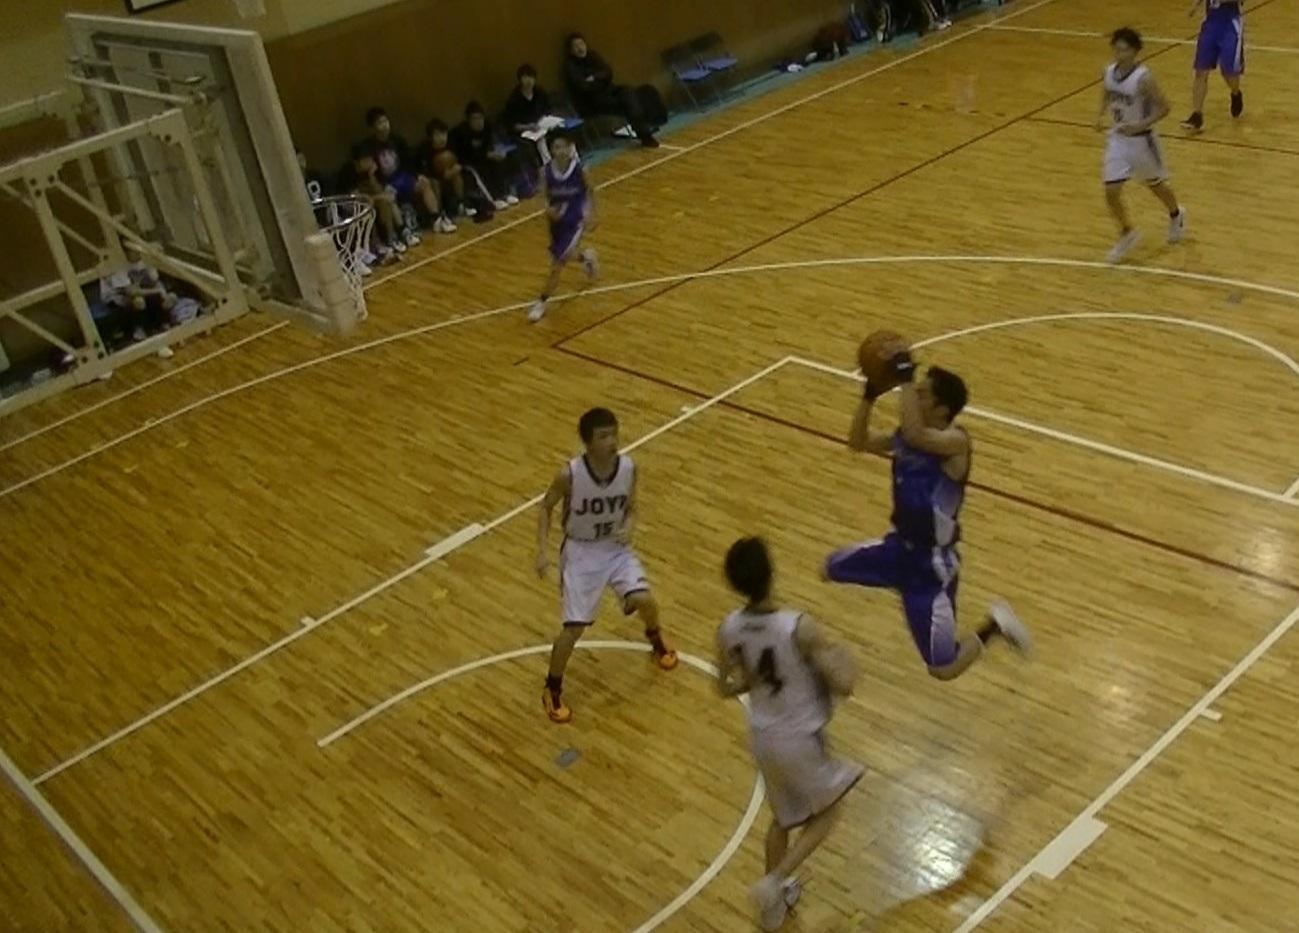 http://www.kyoto-be.ne.jp/nishijyouyou-hs/mt/club/images/basketboy180121%E5%9F%8E%E9%99%BD1.jpg